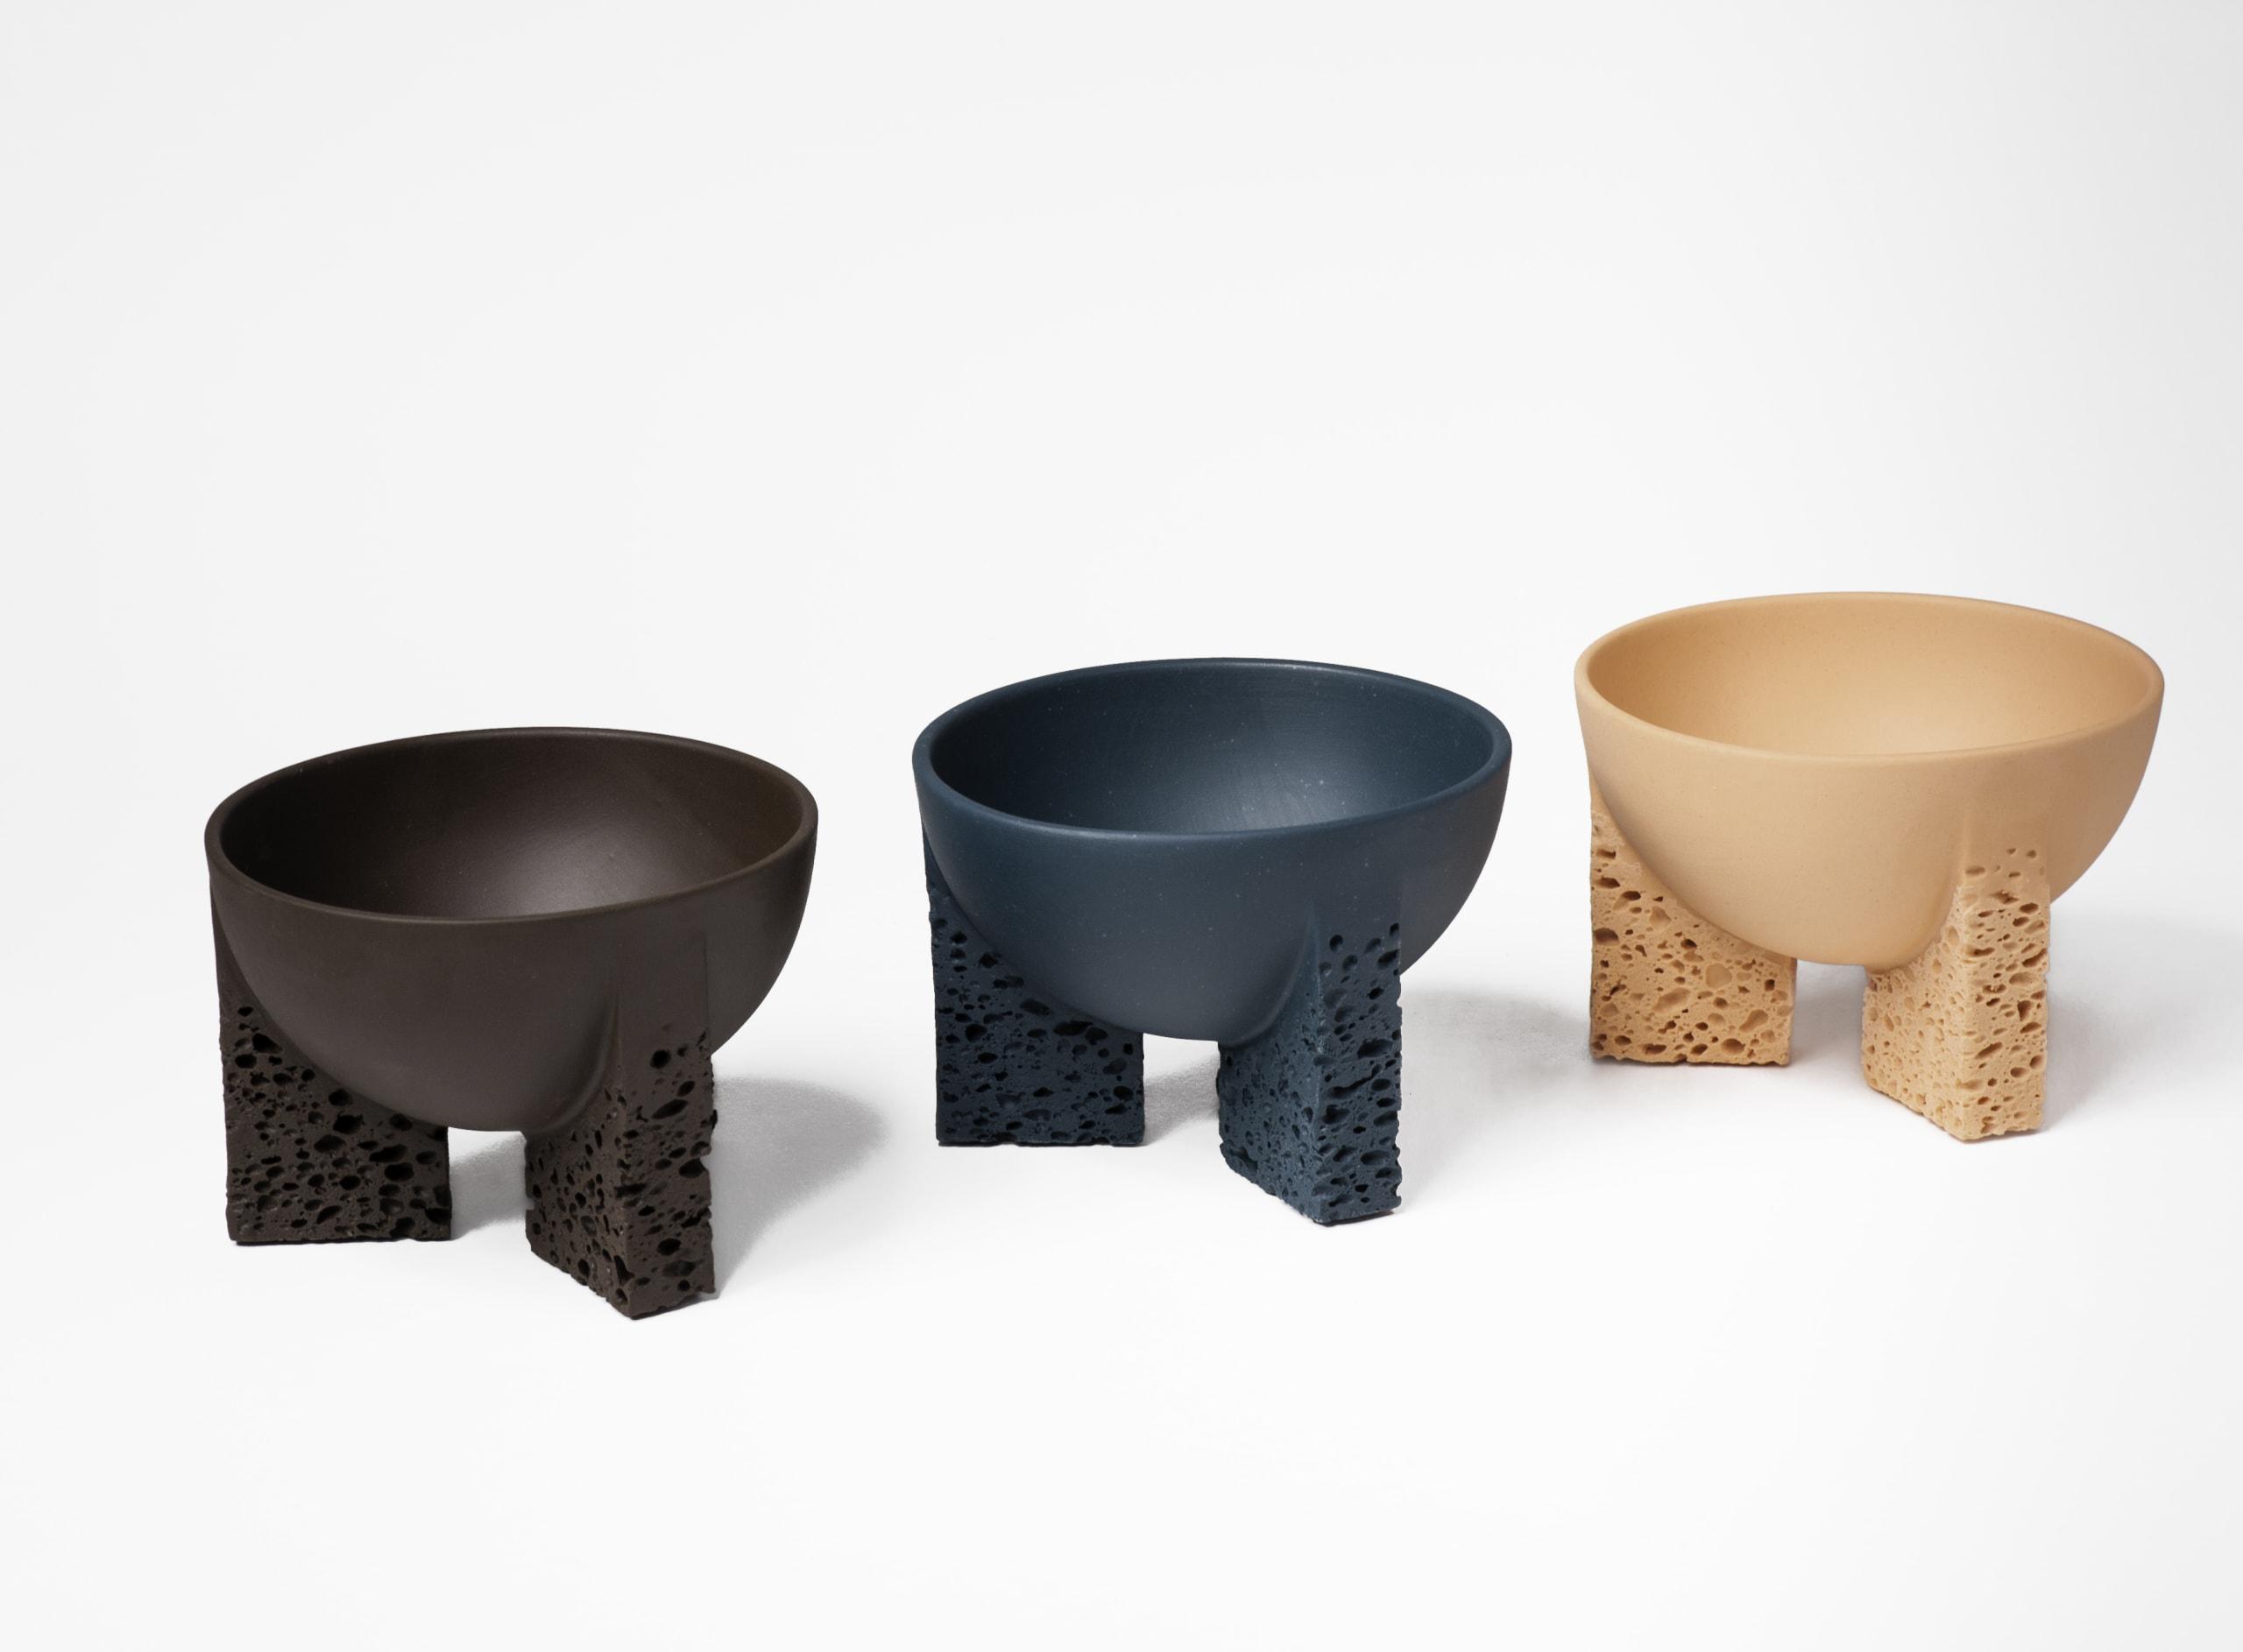 """Studio Furthermore Tektites Bowls, Large in various colors"""